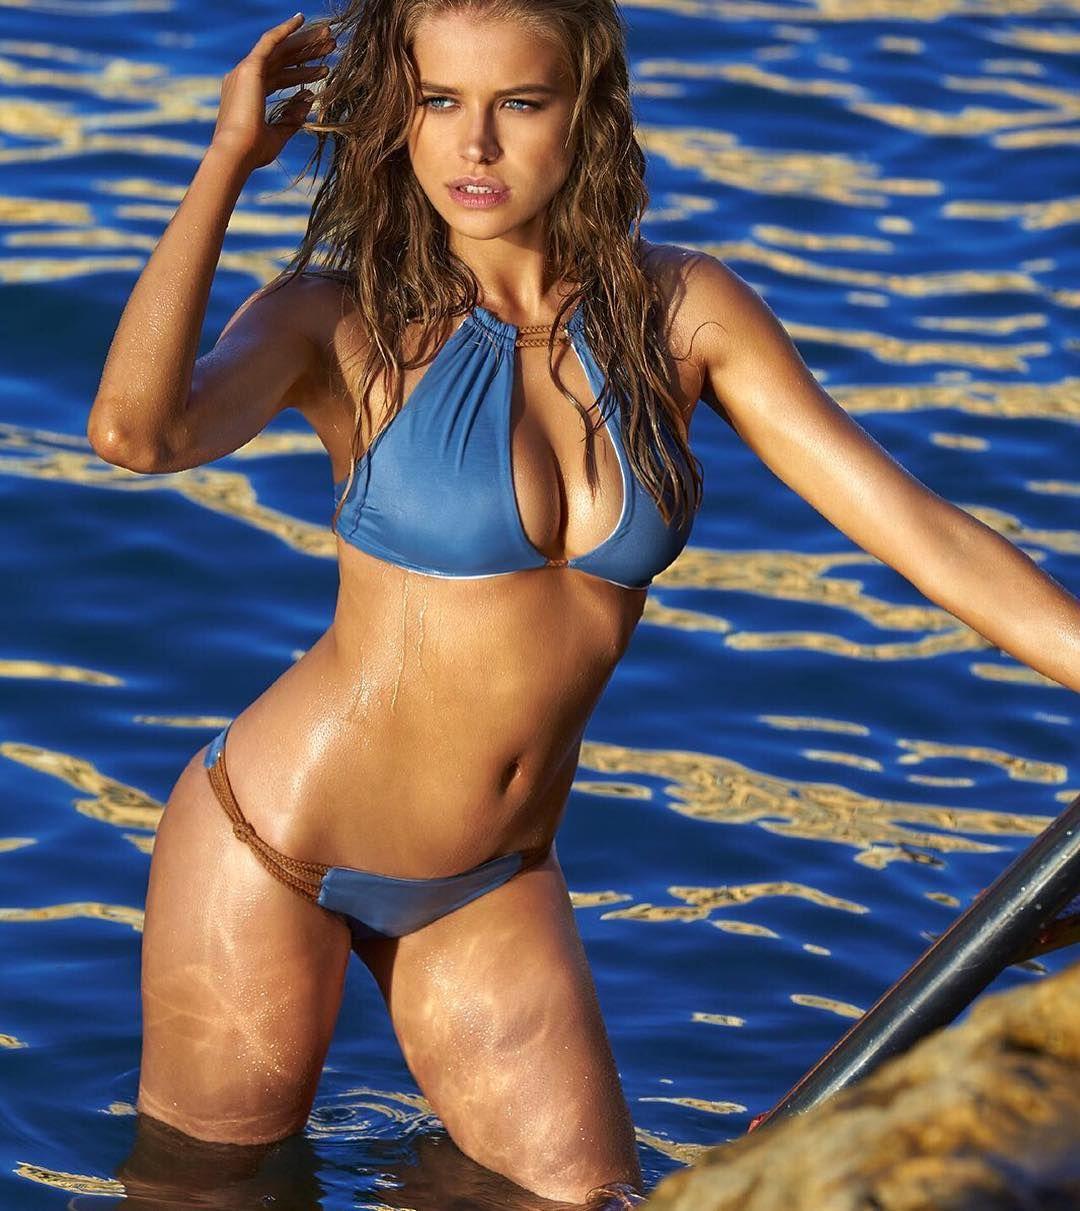 Hacked Tanya Mityushina nude photos 2019